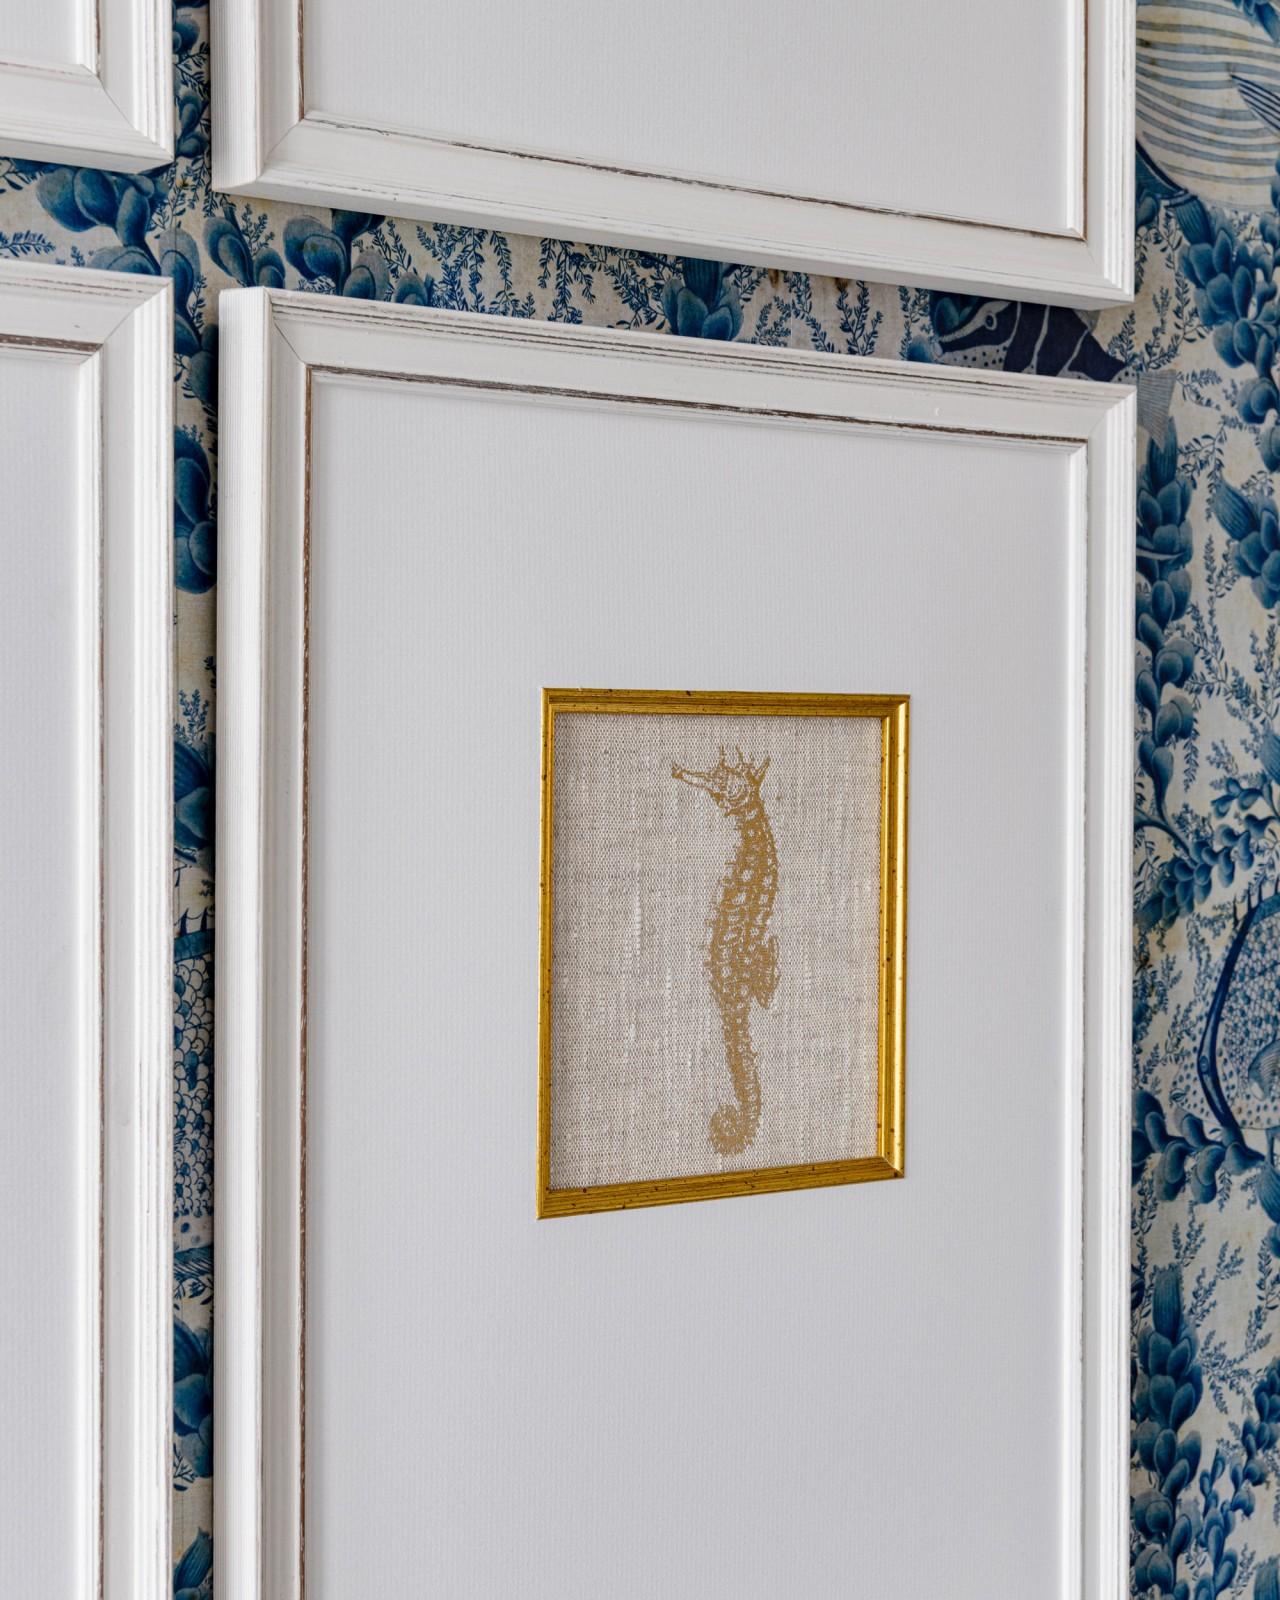 MEDITERRANEAN GEMS - SEAHORSE Framed Linen